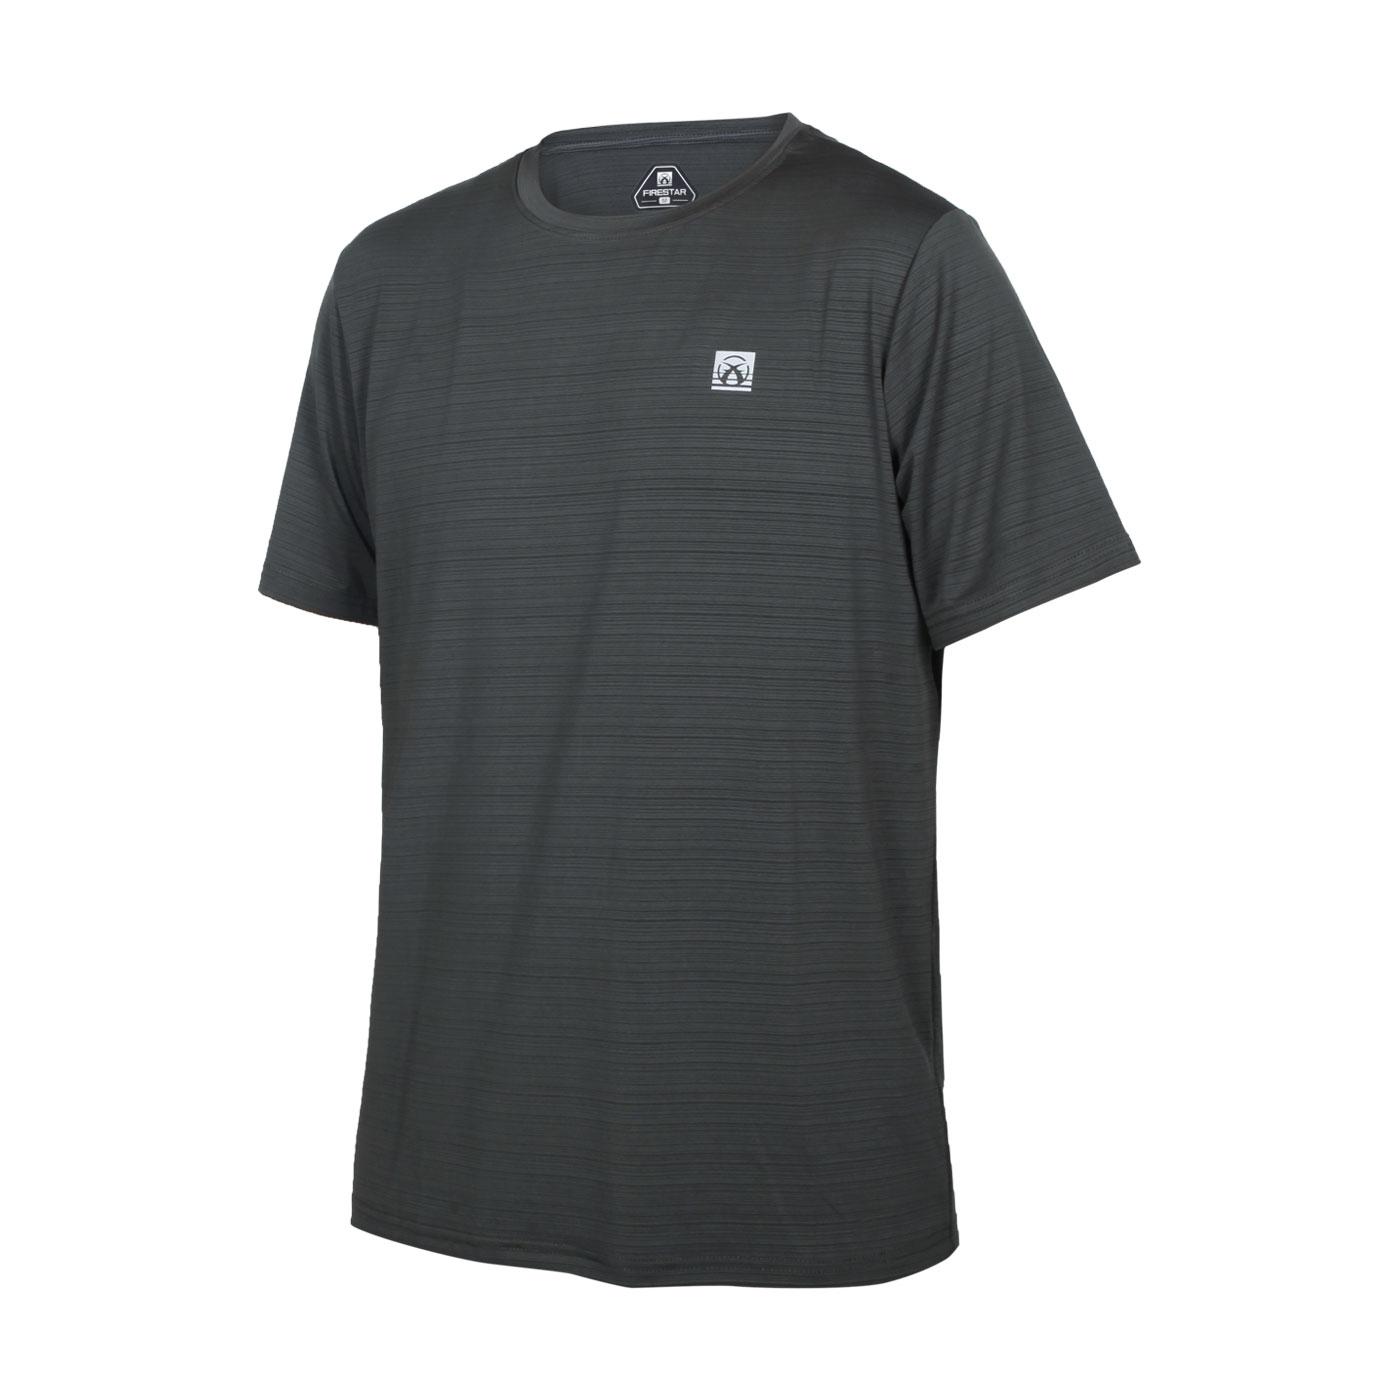 FIRESTAR 男彈性機能短袖圓領T恤 D1733-16